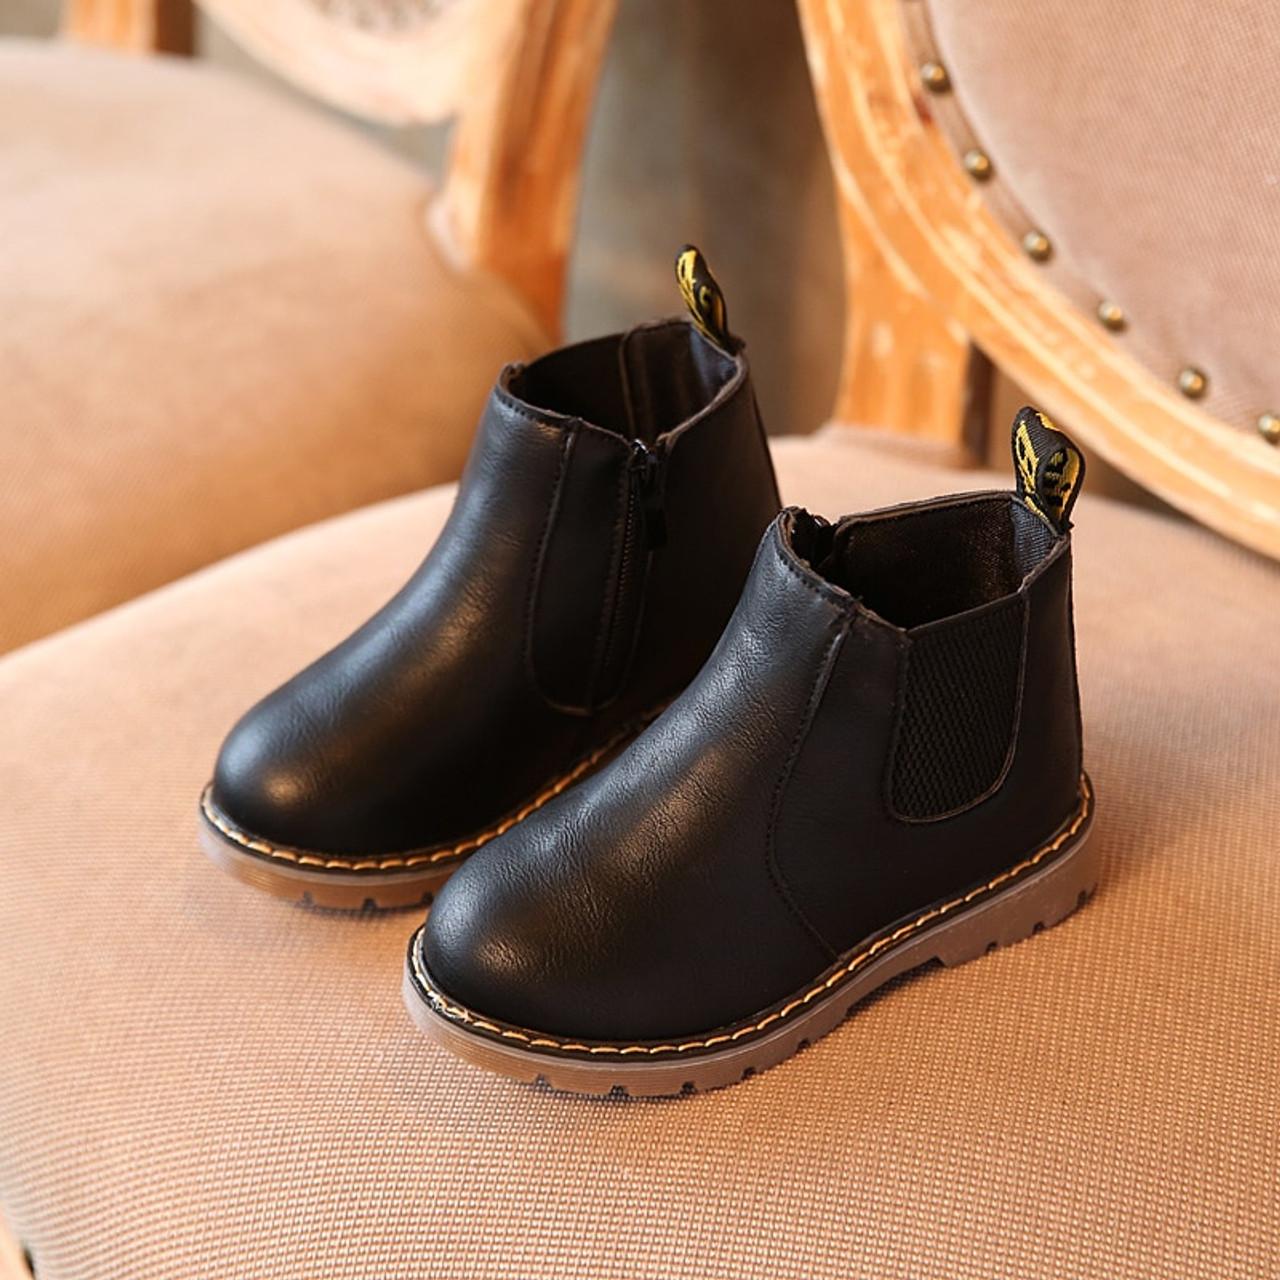 Hot SALE Children Shoes Boys Boots Autumn Winter Fashion Boys Gentleman  Shoes Kids Leather Shoes Girls Martin Boots Size 21,36